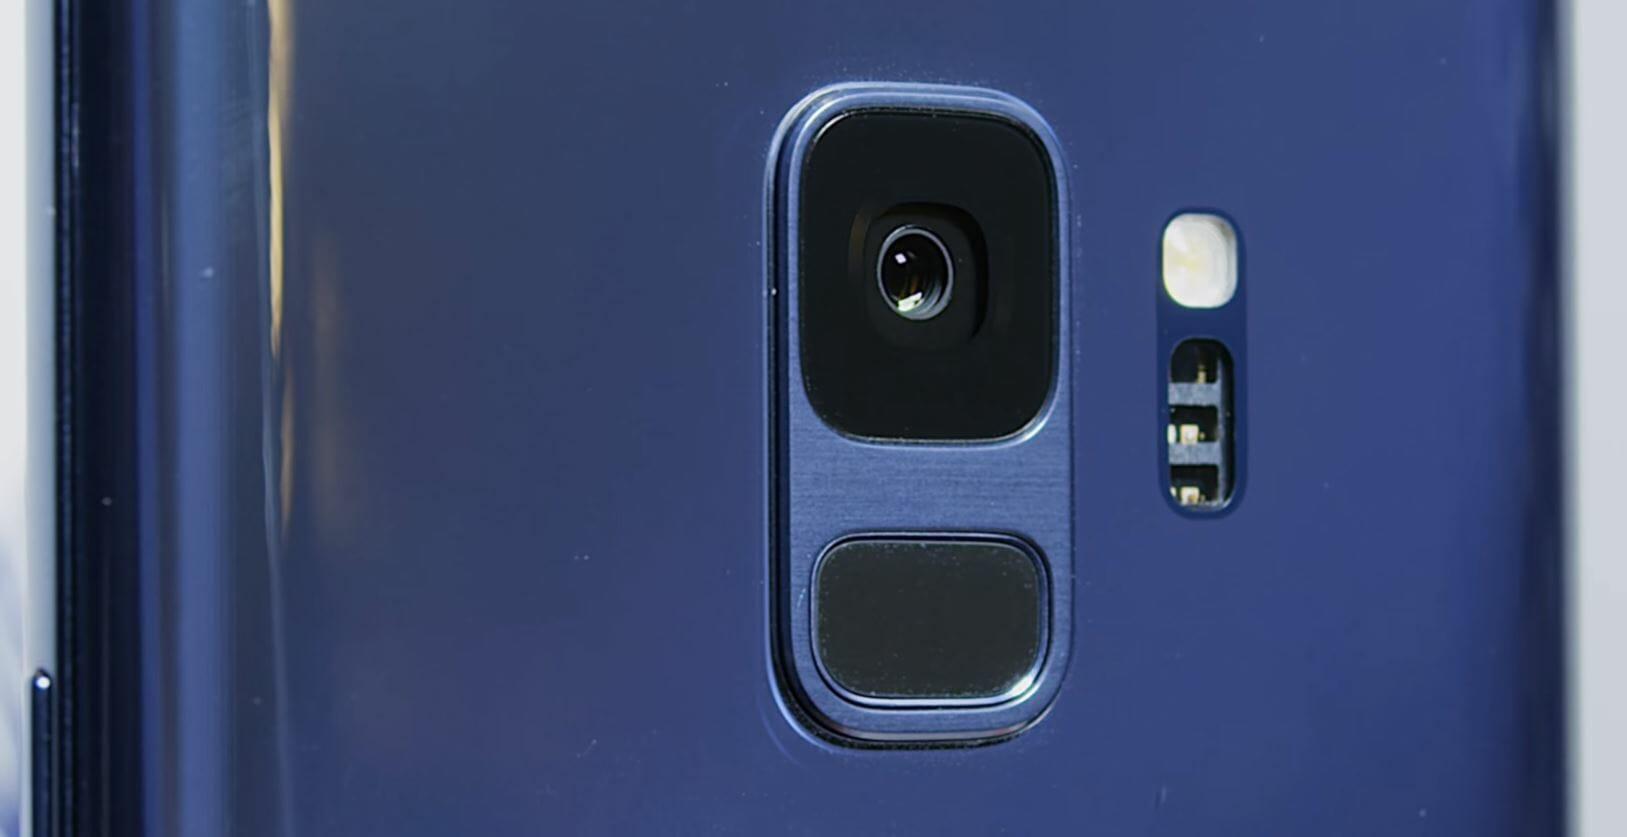 samsung galaxy s9 dual-aperture camera lens